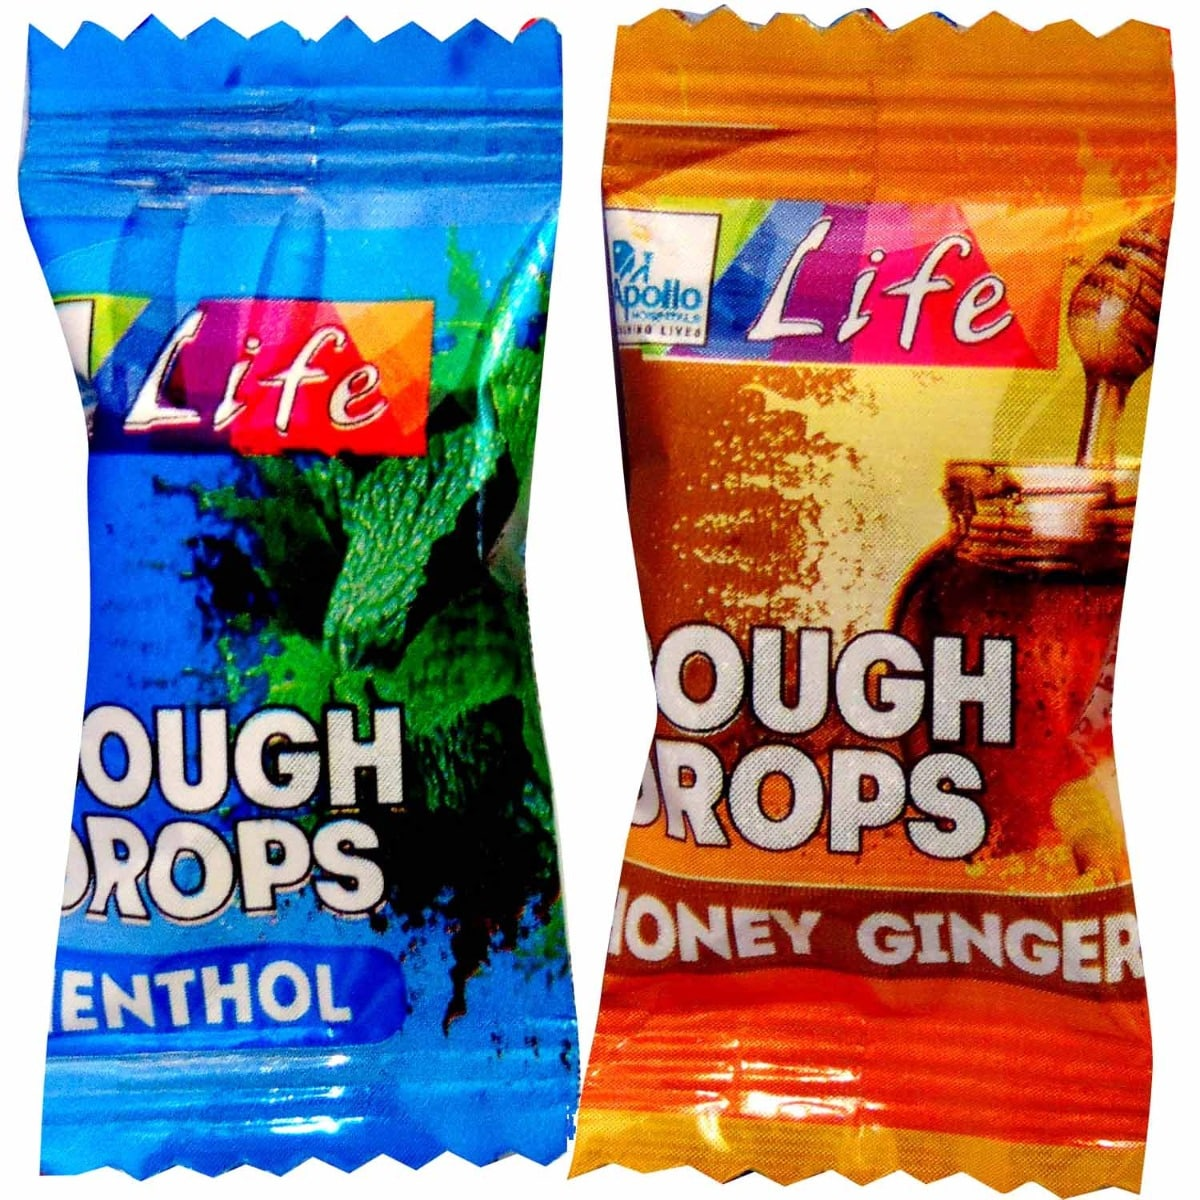 Apollo Life Menthol, Honey, Ginger Flavour Cough Drops, 2 Count